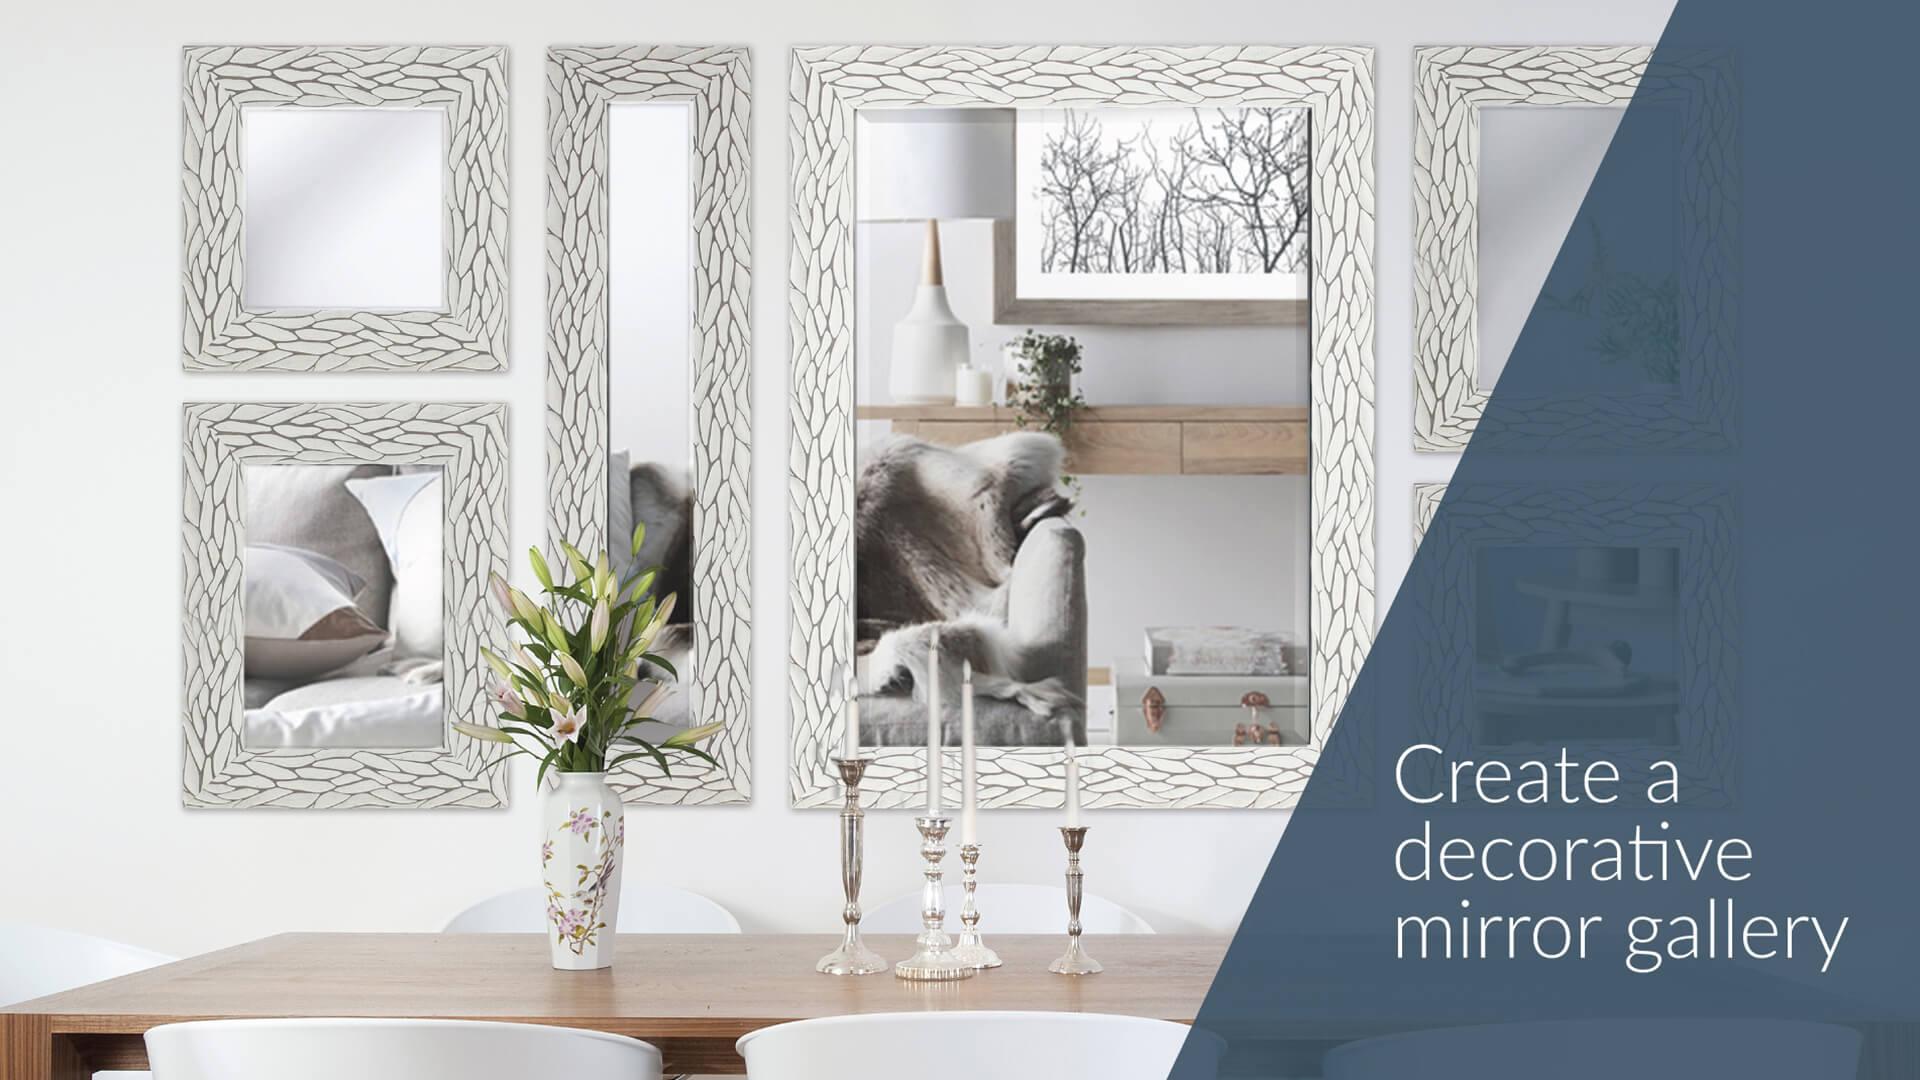 Custom Decorative Mirrors by Mirrorize.ca